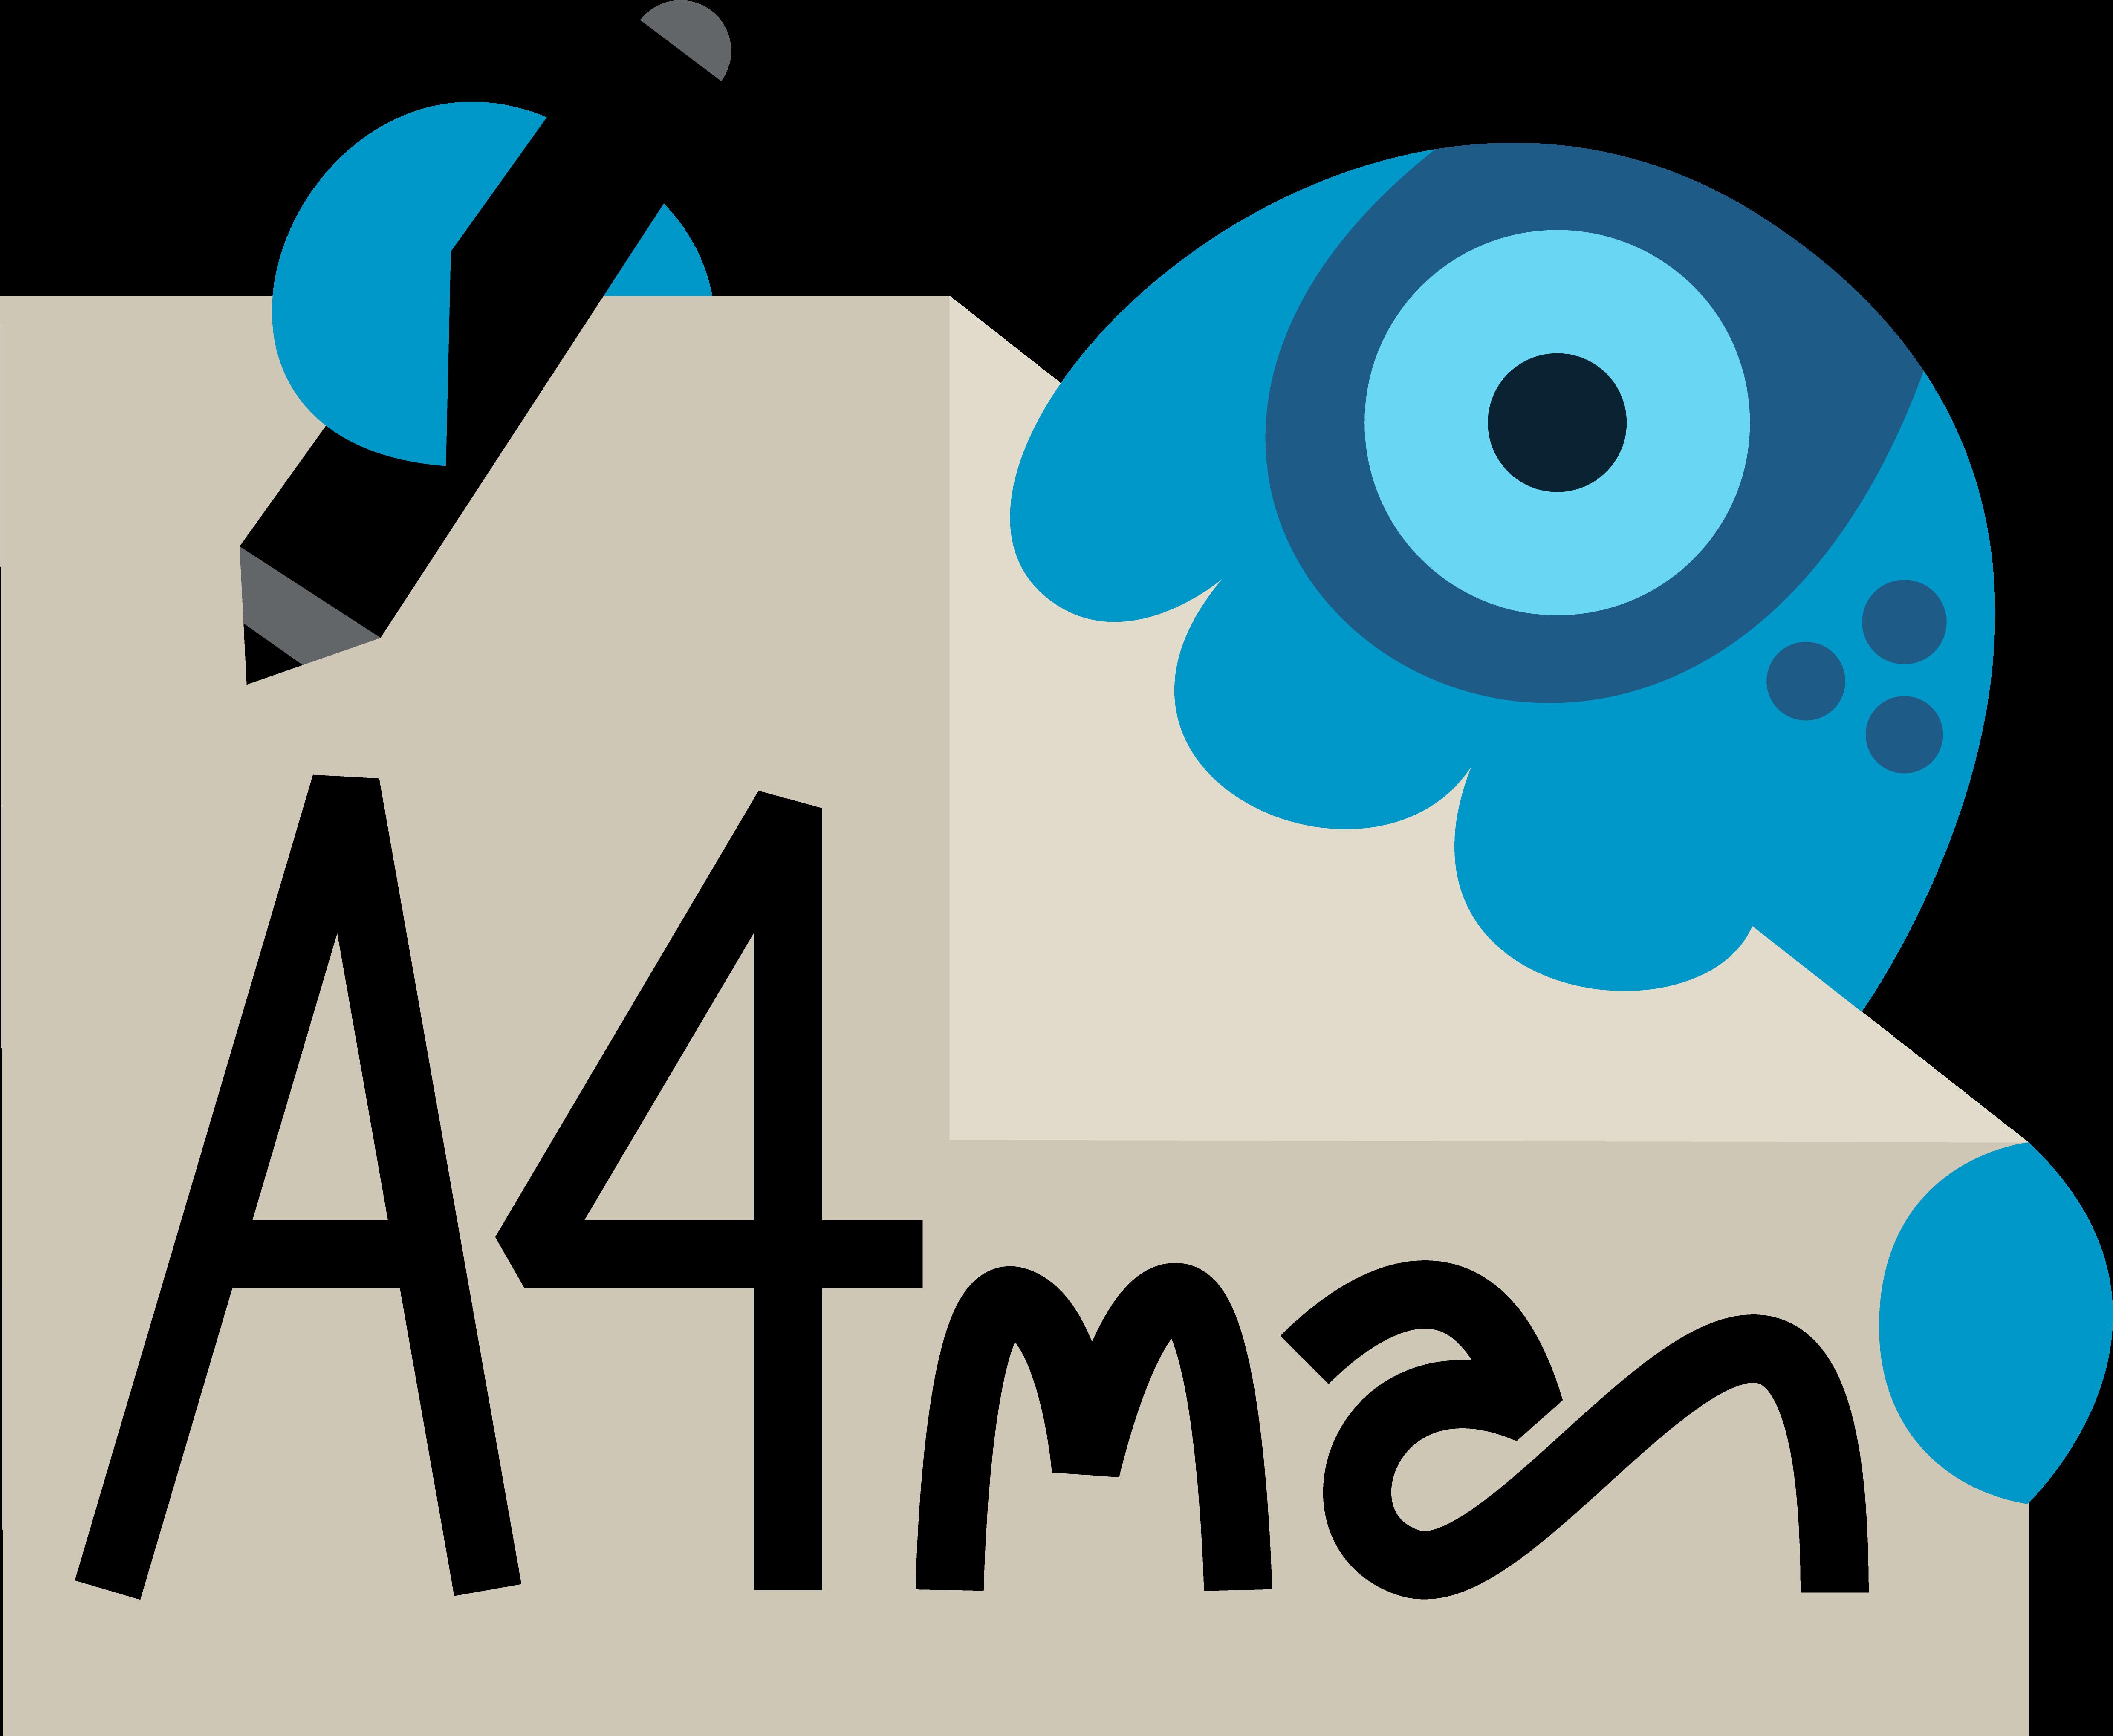 A4man.Logo